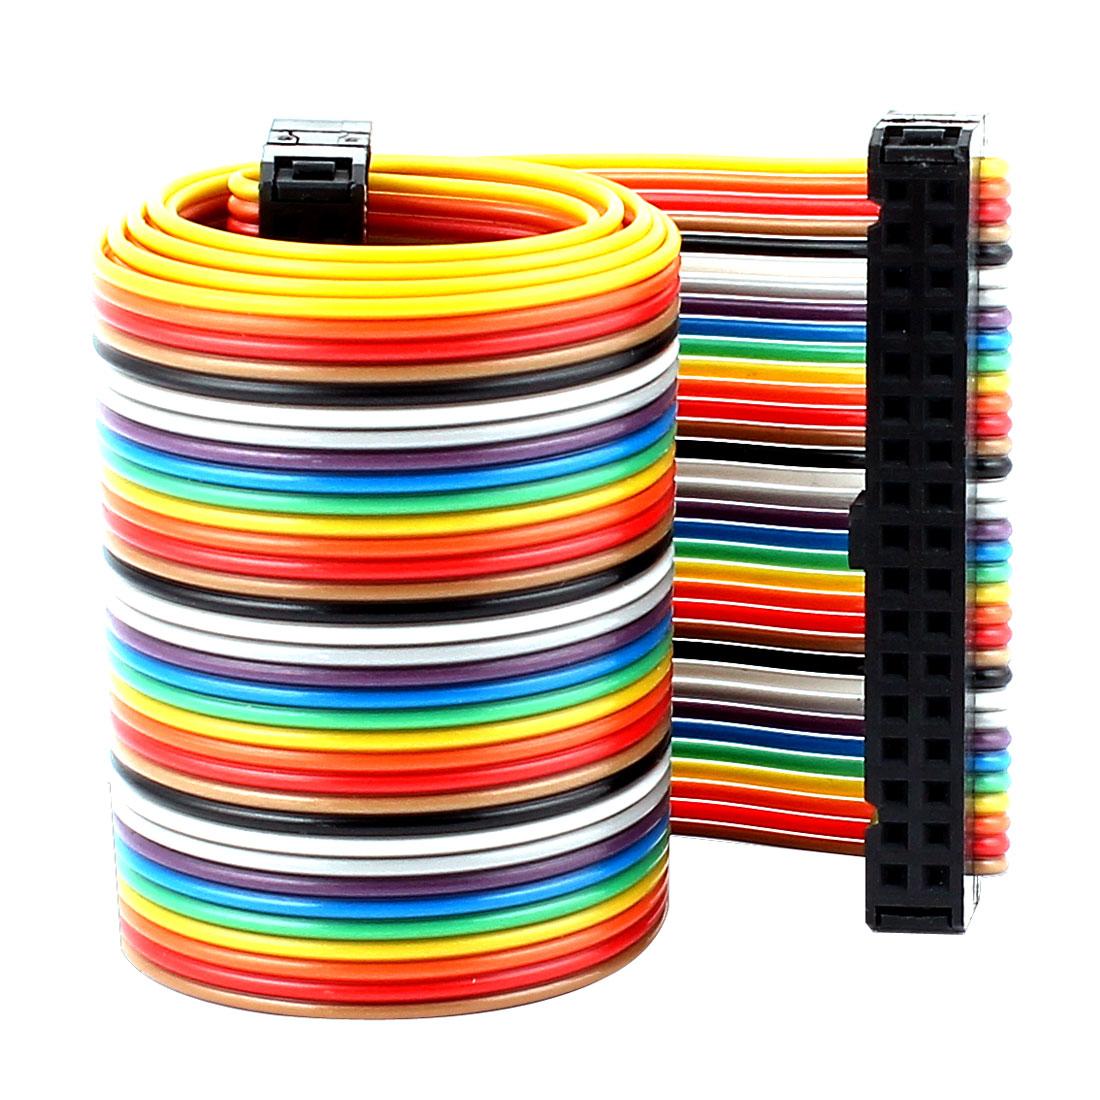 48cm 34pin 2.54mm Female to Female Breadboard IDC Wire Cable